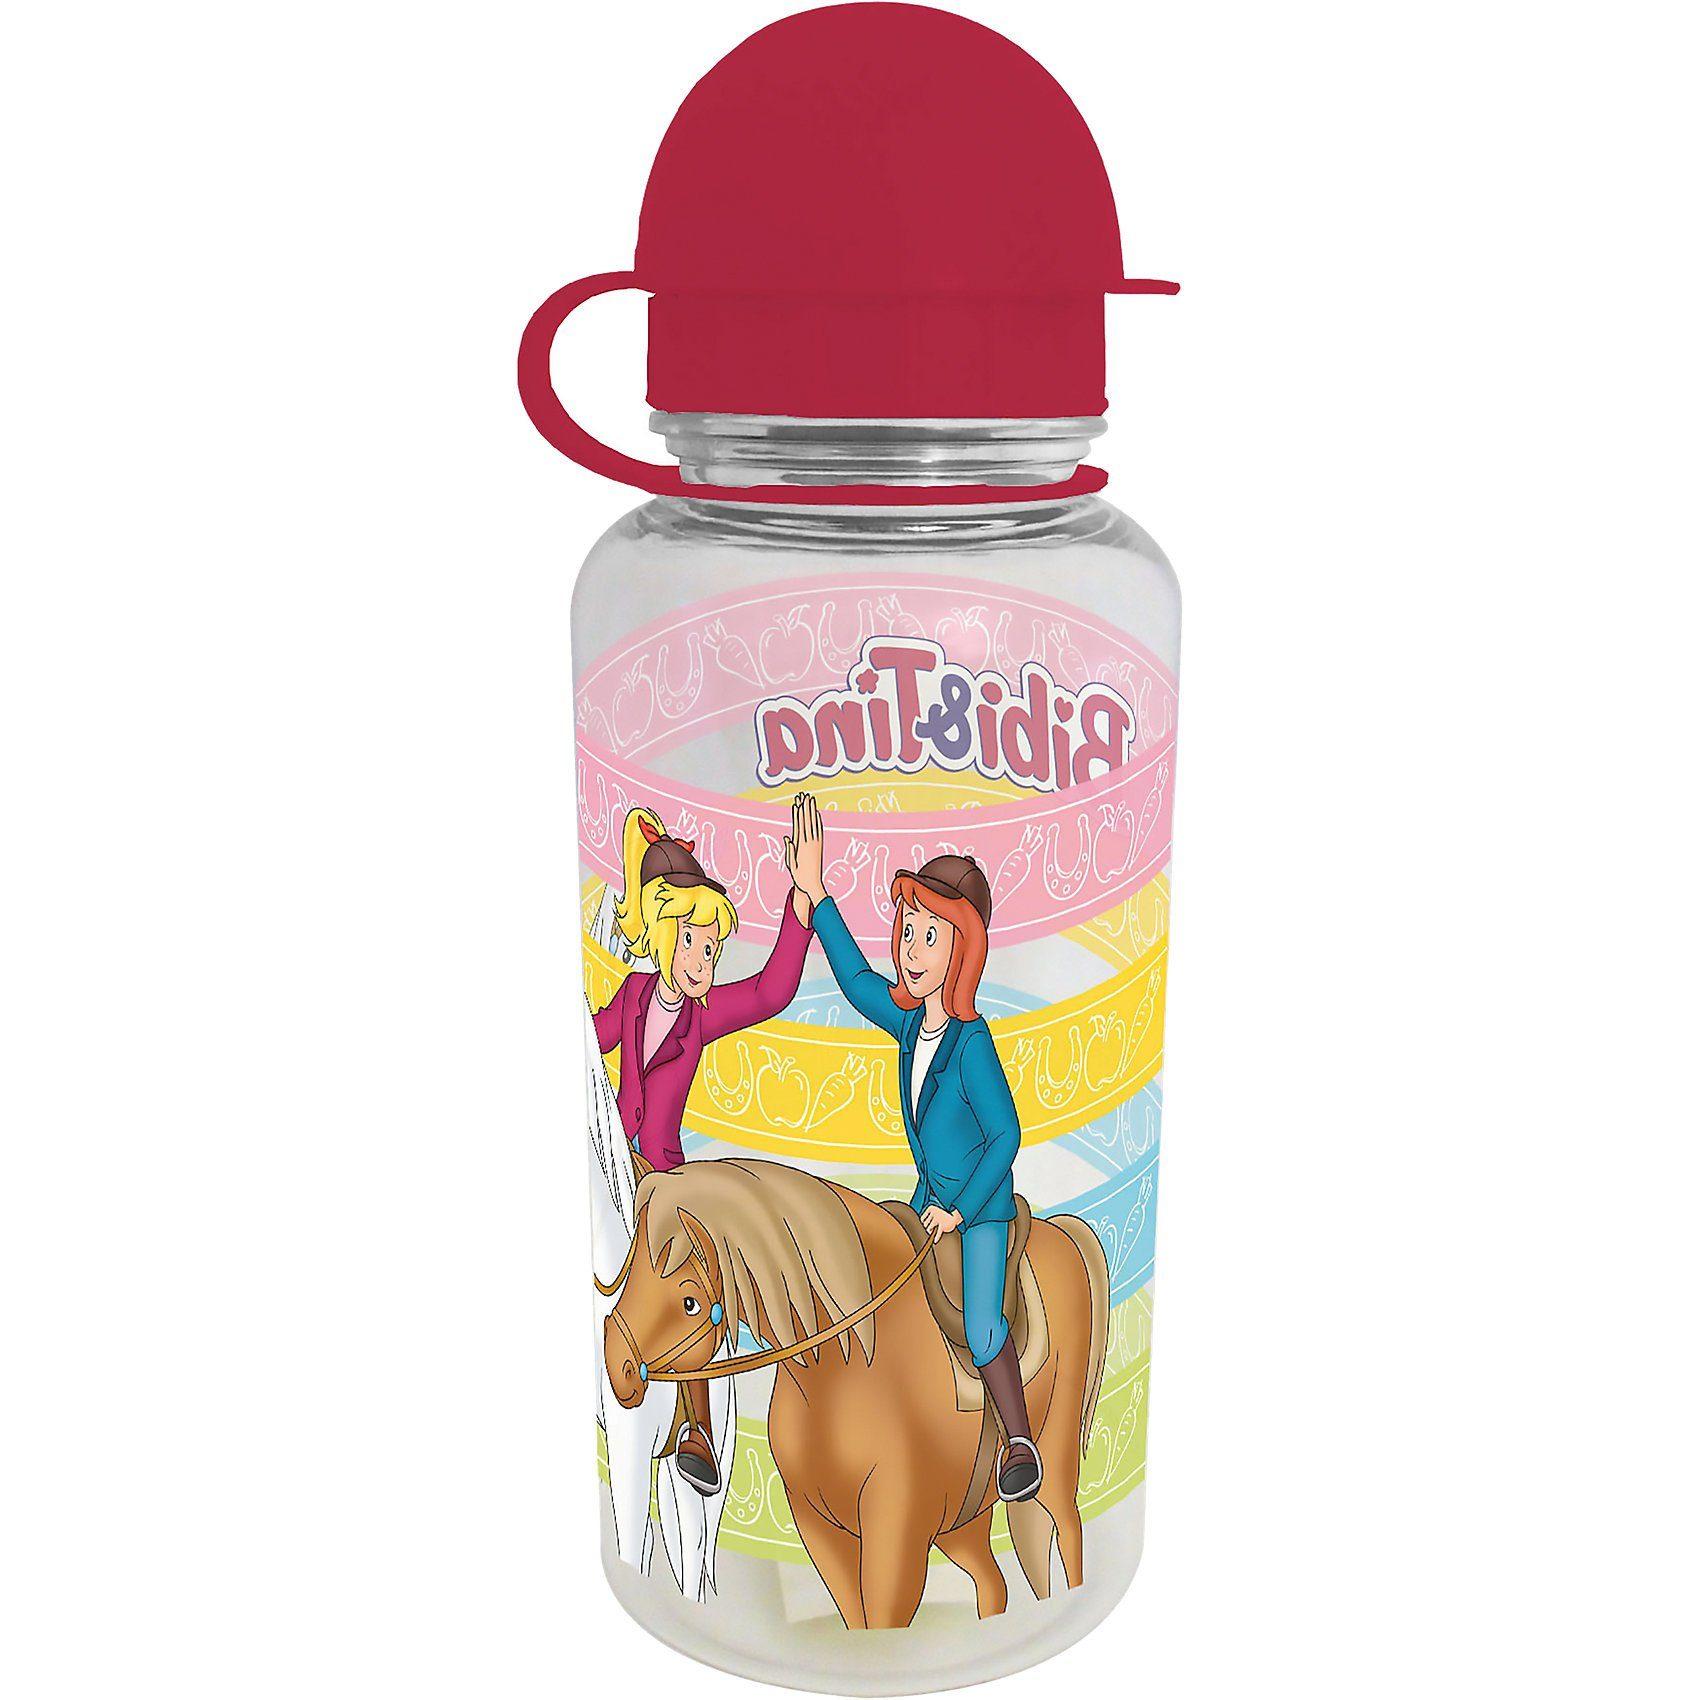 Tritanflasche Bibi & Tina Freunde, 350 ml